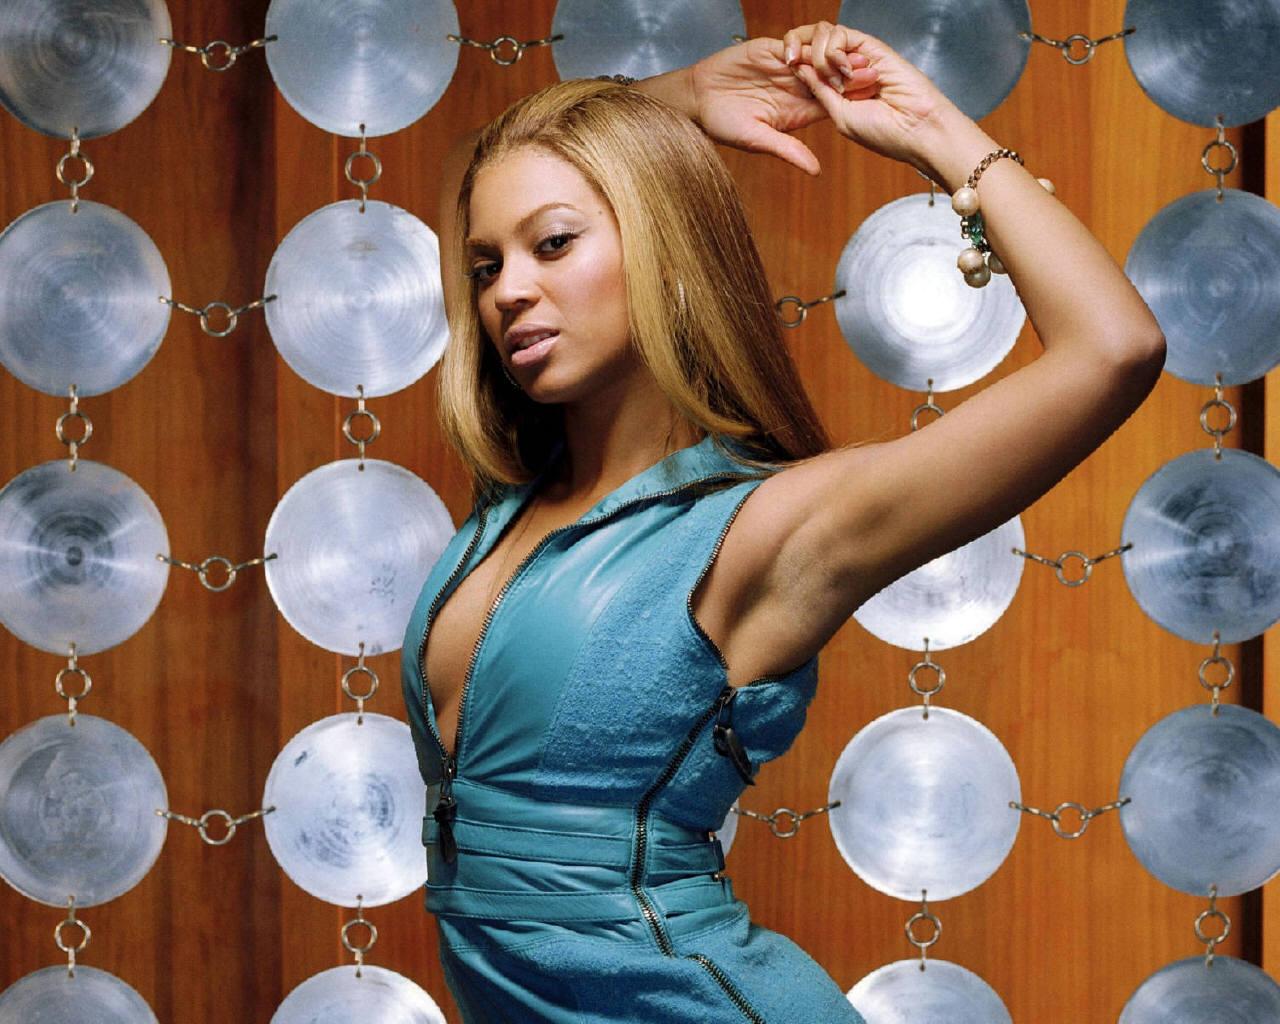 http://4.bp.blogspot.com/_9lSwJ-jeXxQ/TIwmJUTIo1I/AAAAAAAABPE/hS_SvWGuXbc/s1600/Beyonce-Blue-Dress.jpg